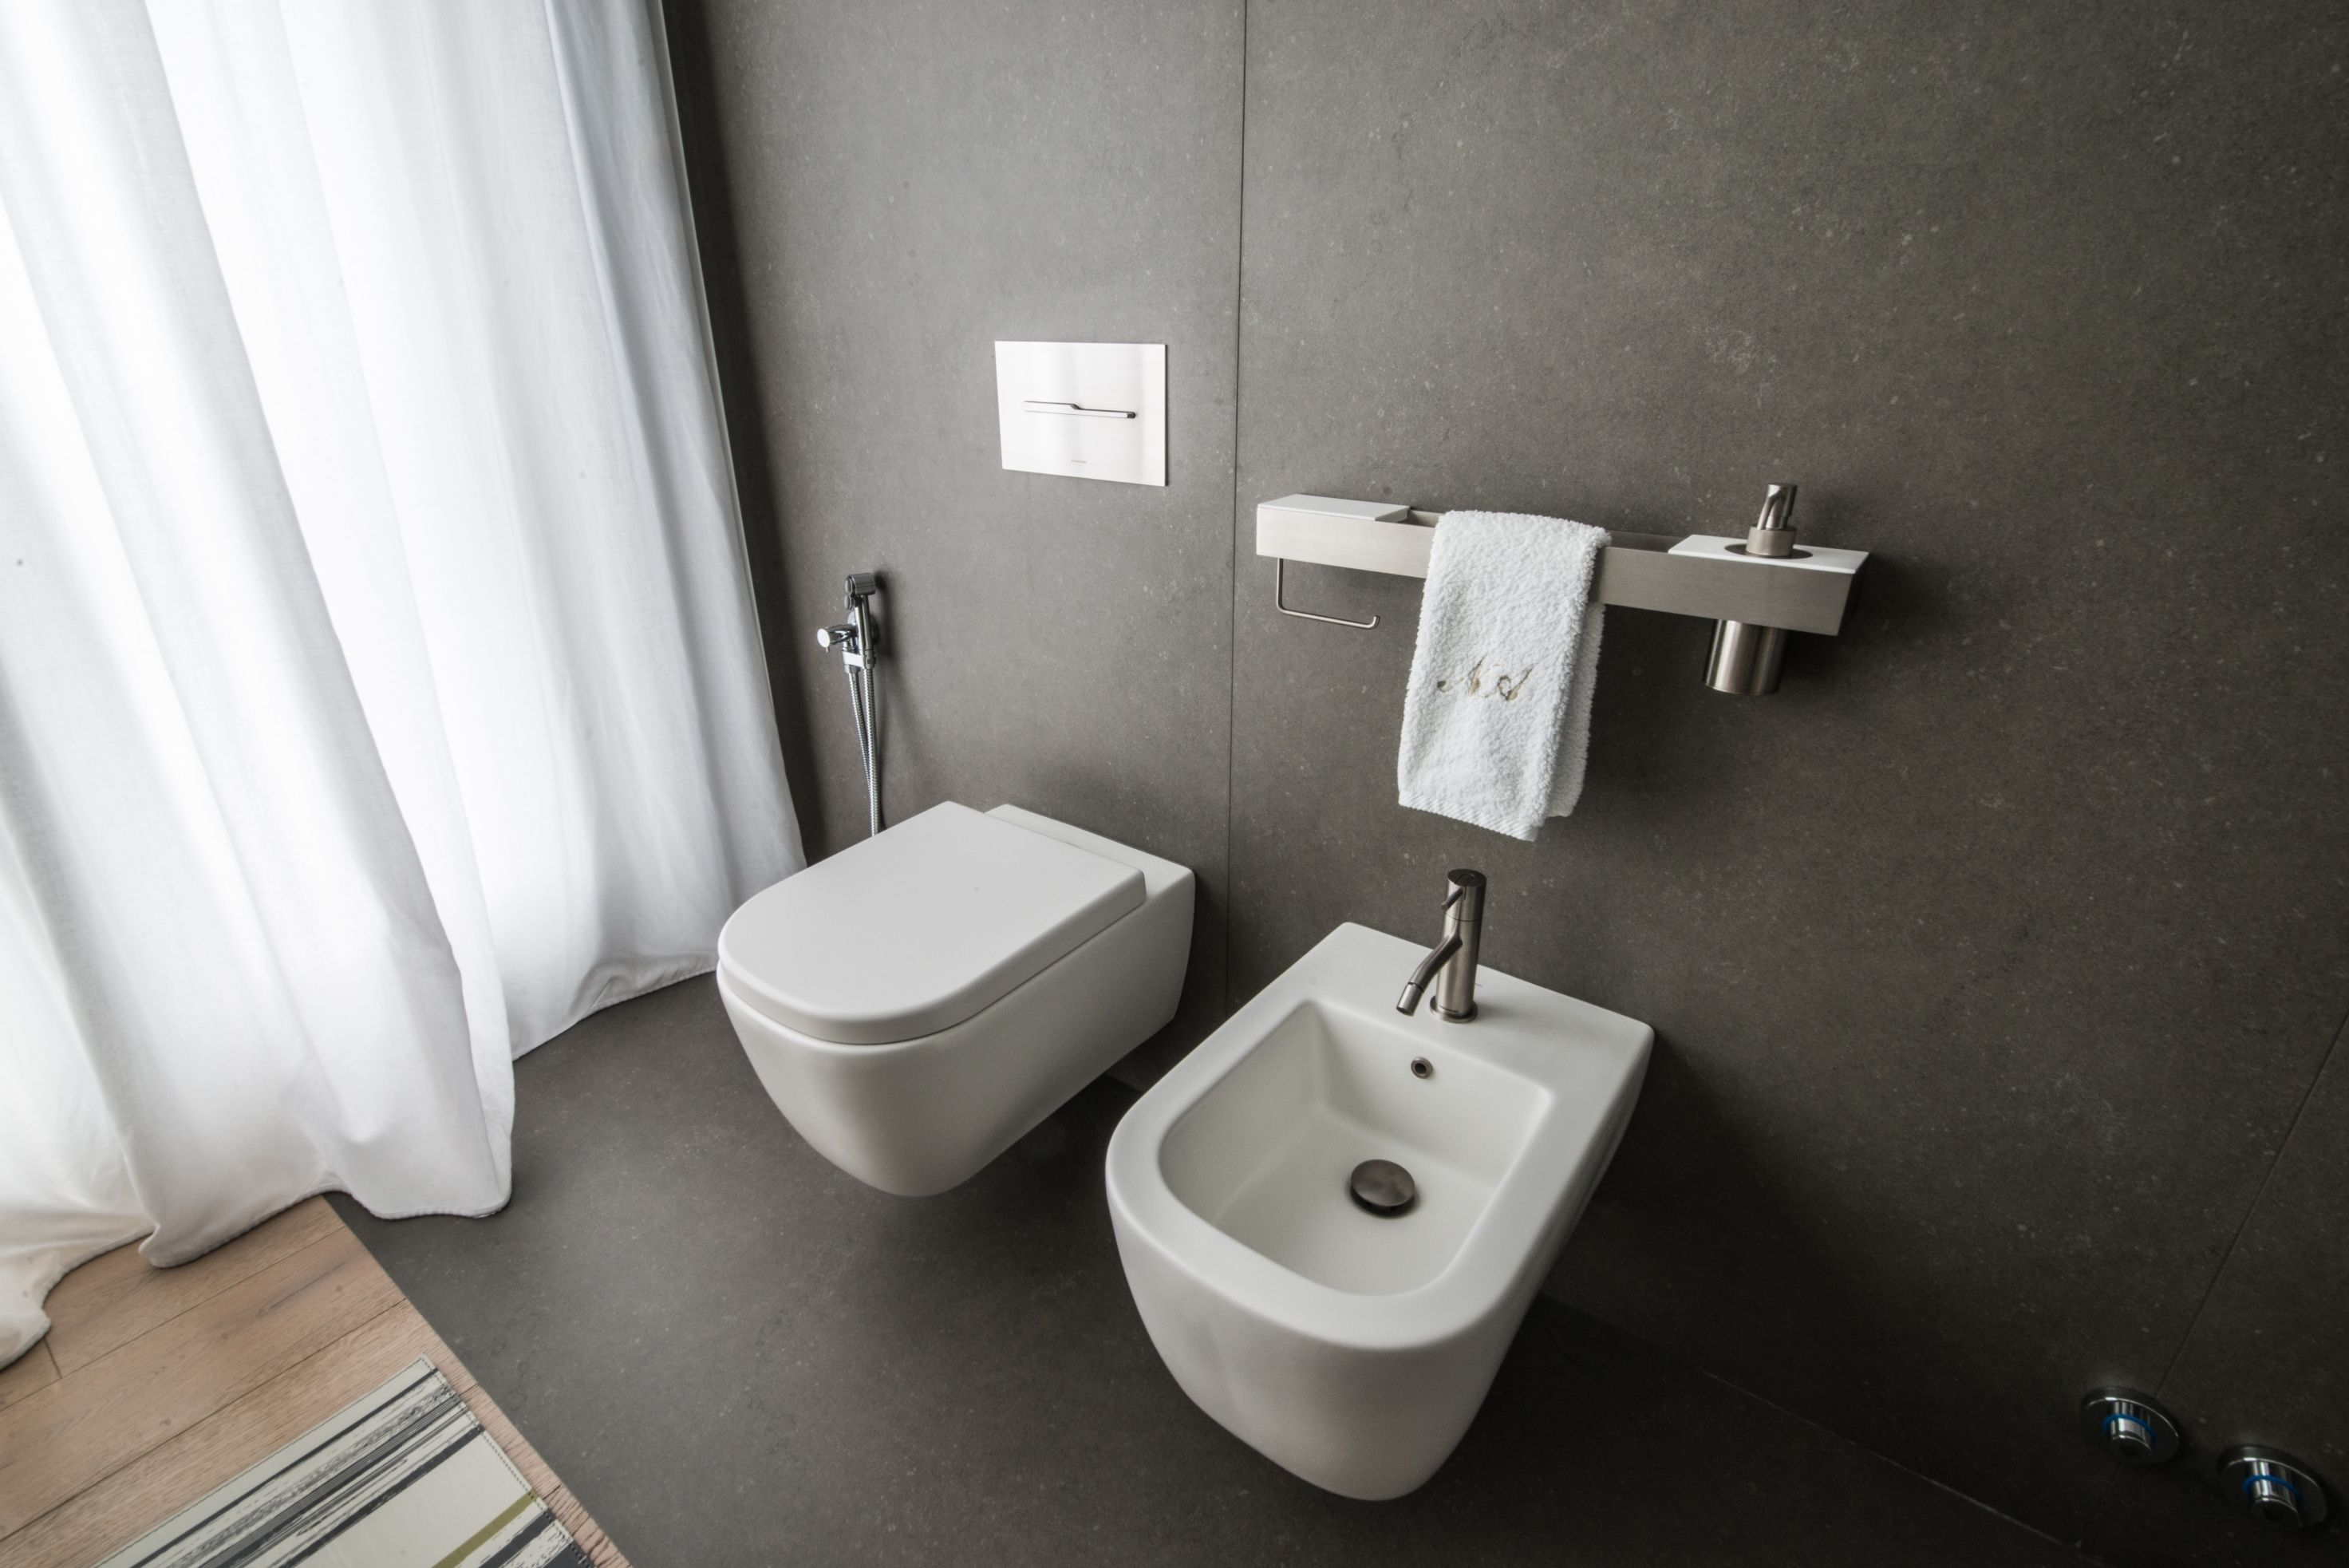 Arredamento mobili bagno sanitari marmo arredo bagno for Arredo bagno vasca